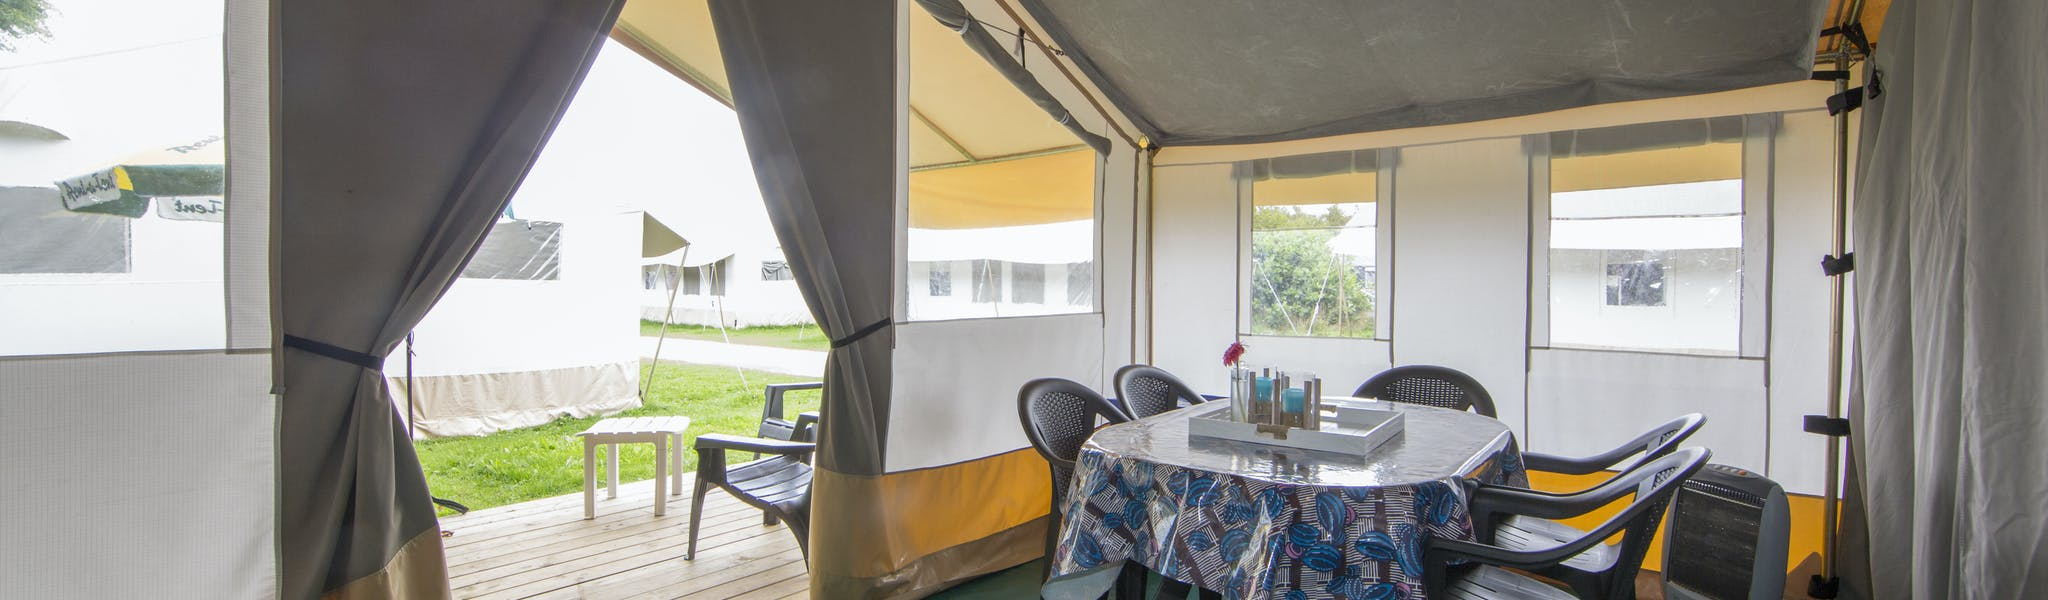 Safaritent Caramel Bon Port interieur